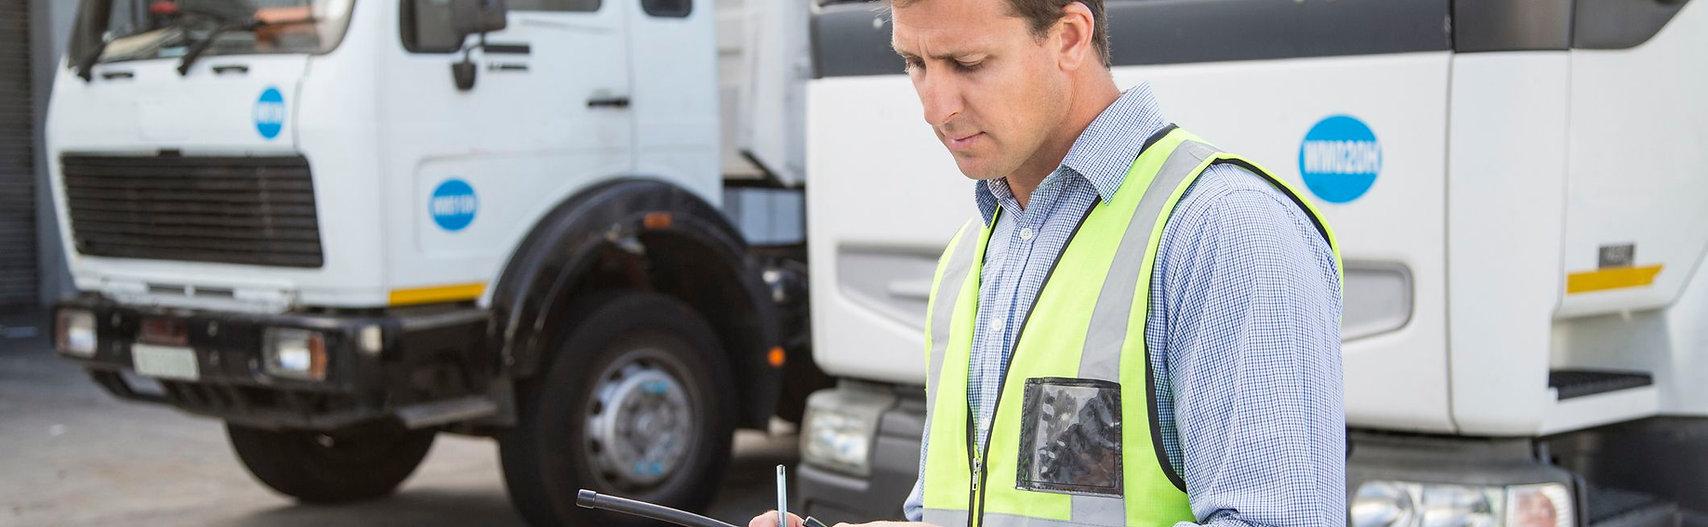 Truck Safety Checks.jpg